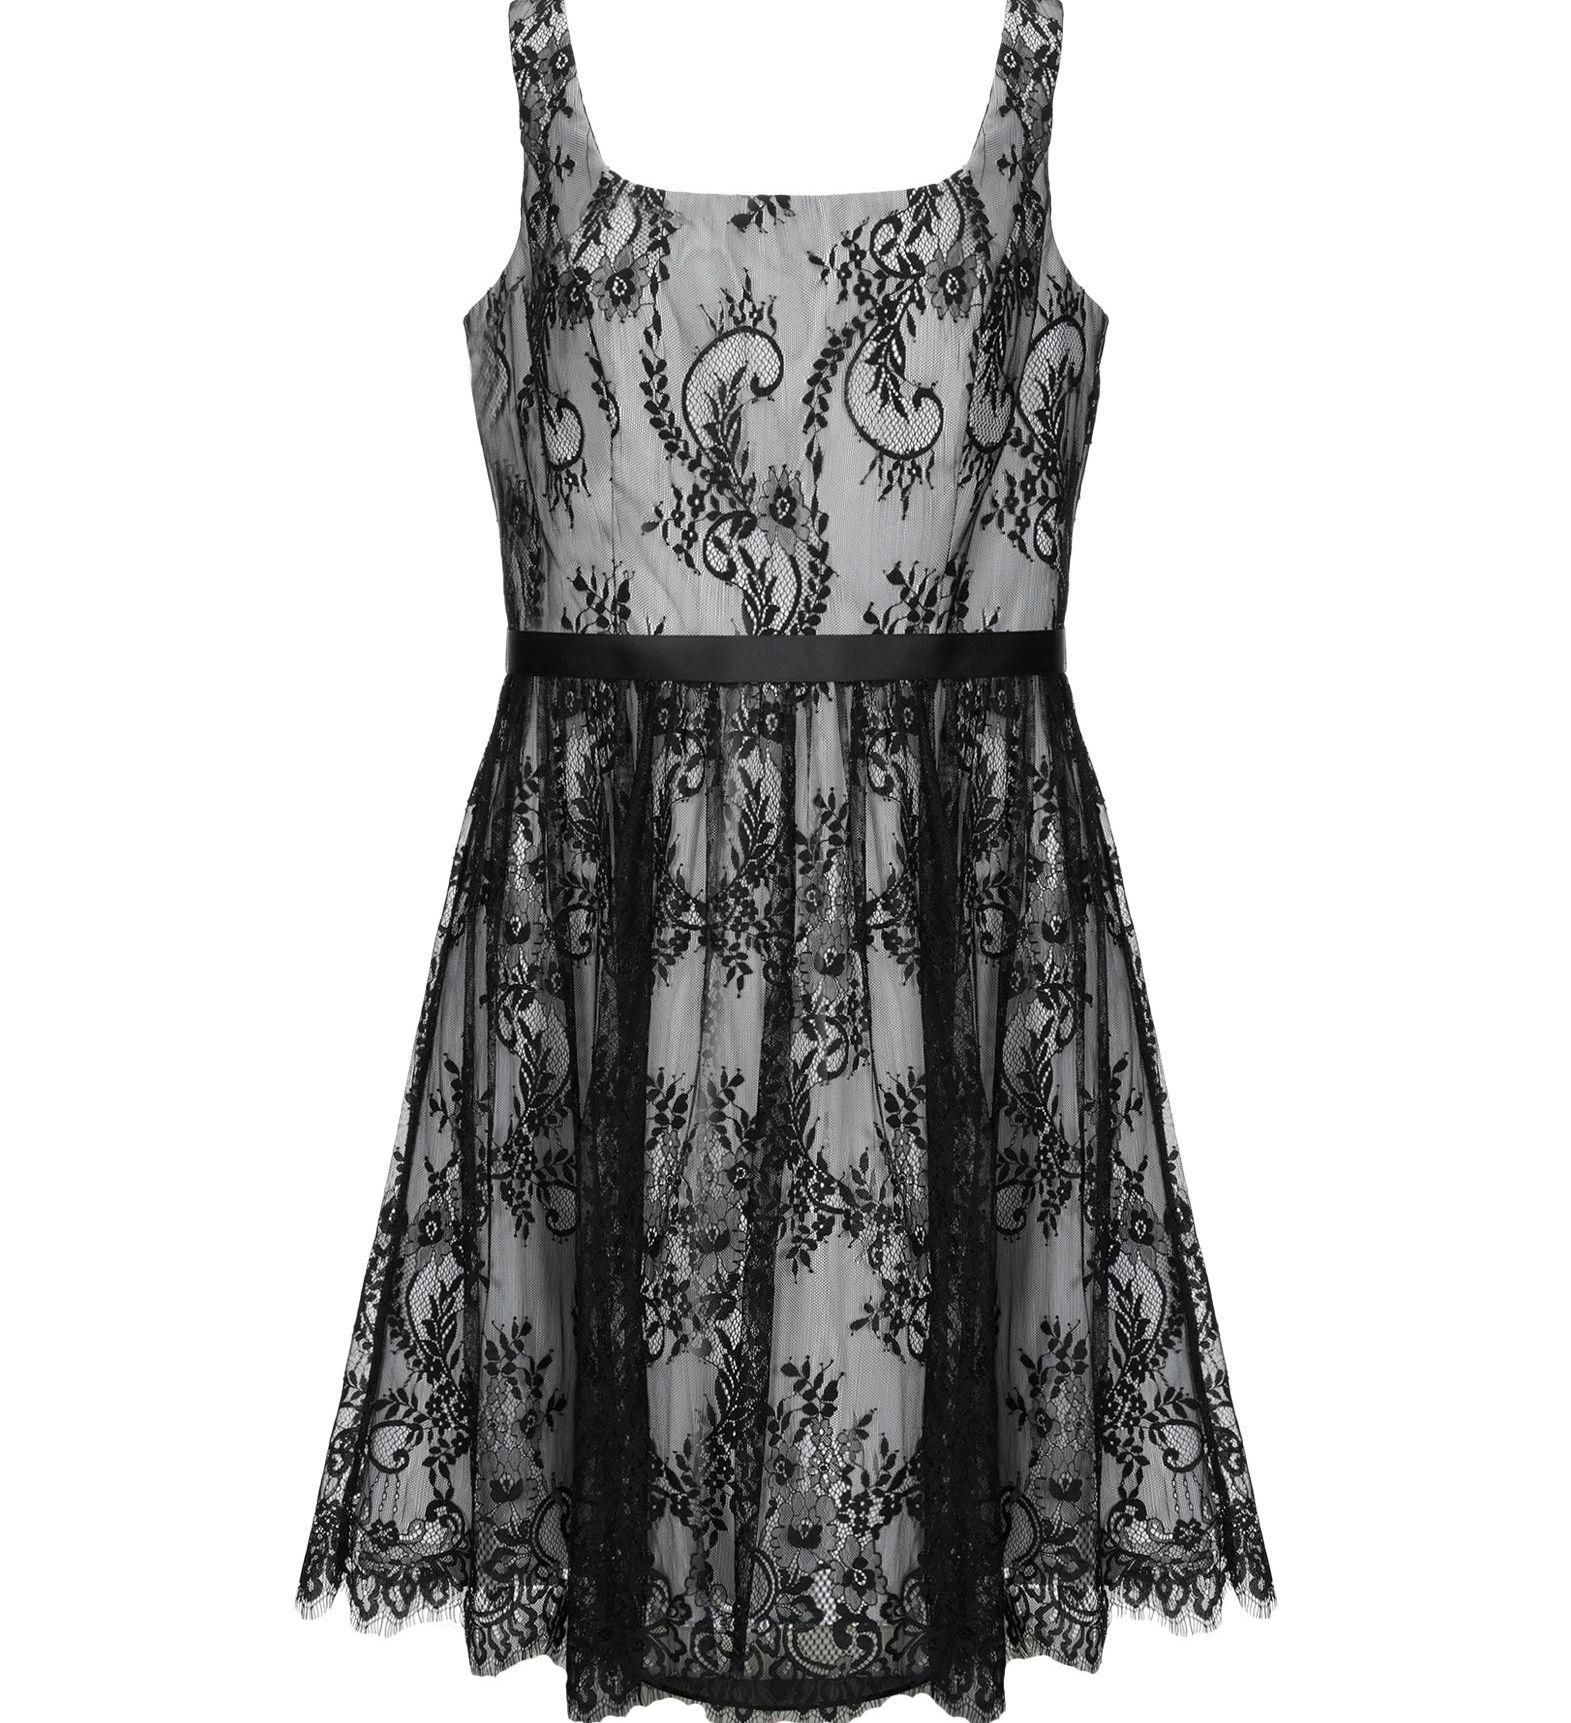 CABOTINE PRIVÉE by GEMA NICOLÁS ΦΟΡΕΜΑΤΑ Κοντό φόρεμα